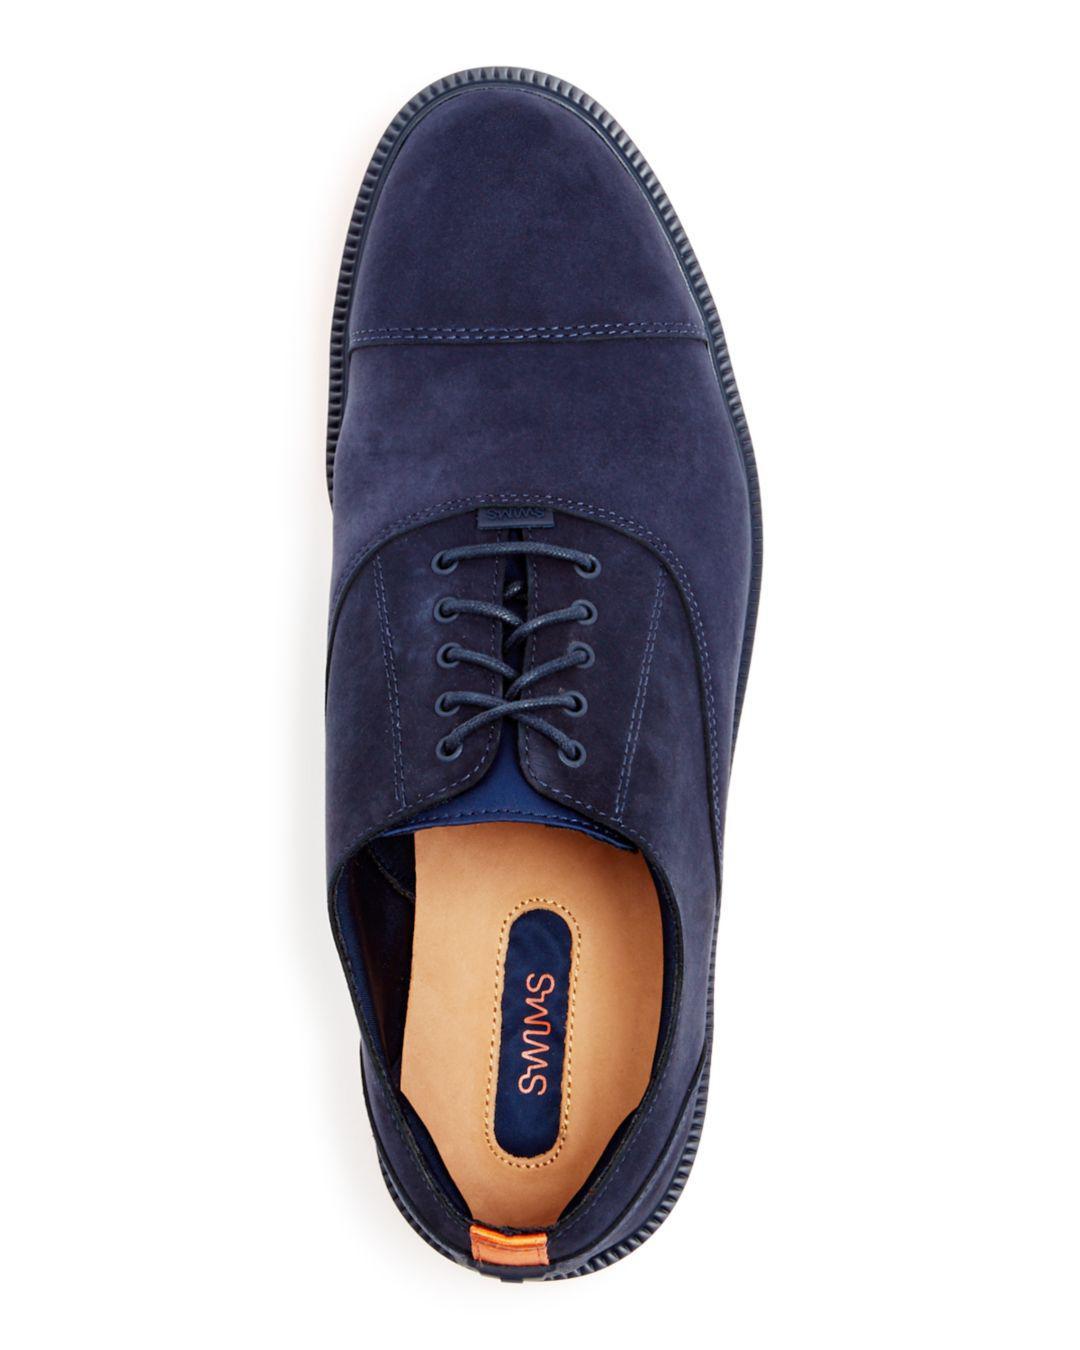 4438f0a693e8 Swims Men s Motion Nubuck Leather Cap Toe Oxfords in Blue for Men - Lyst